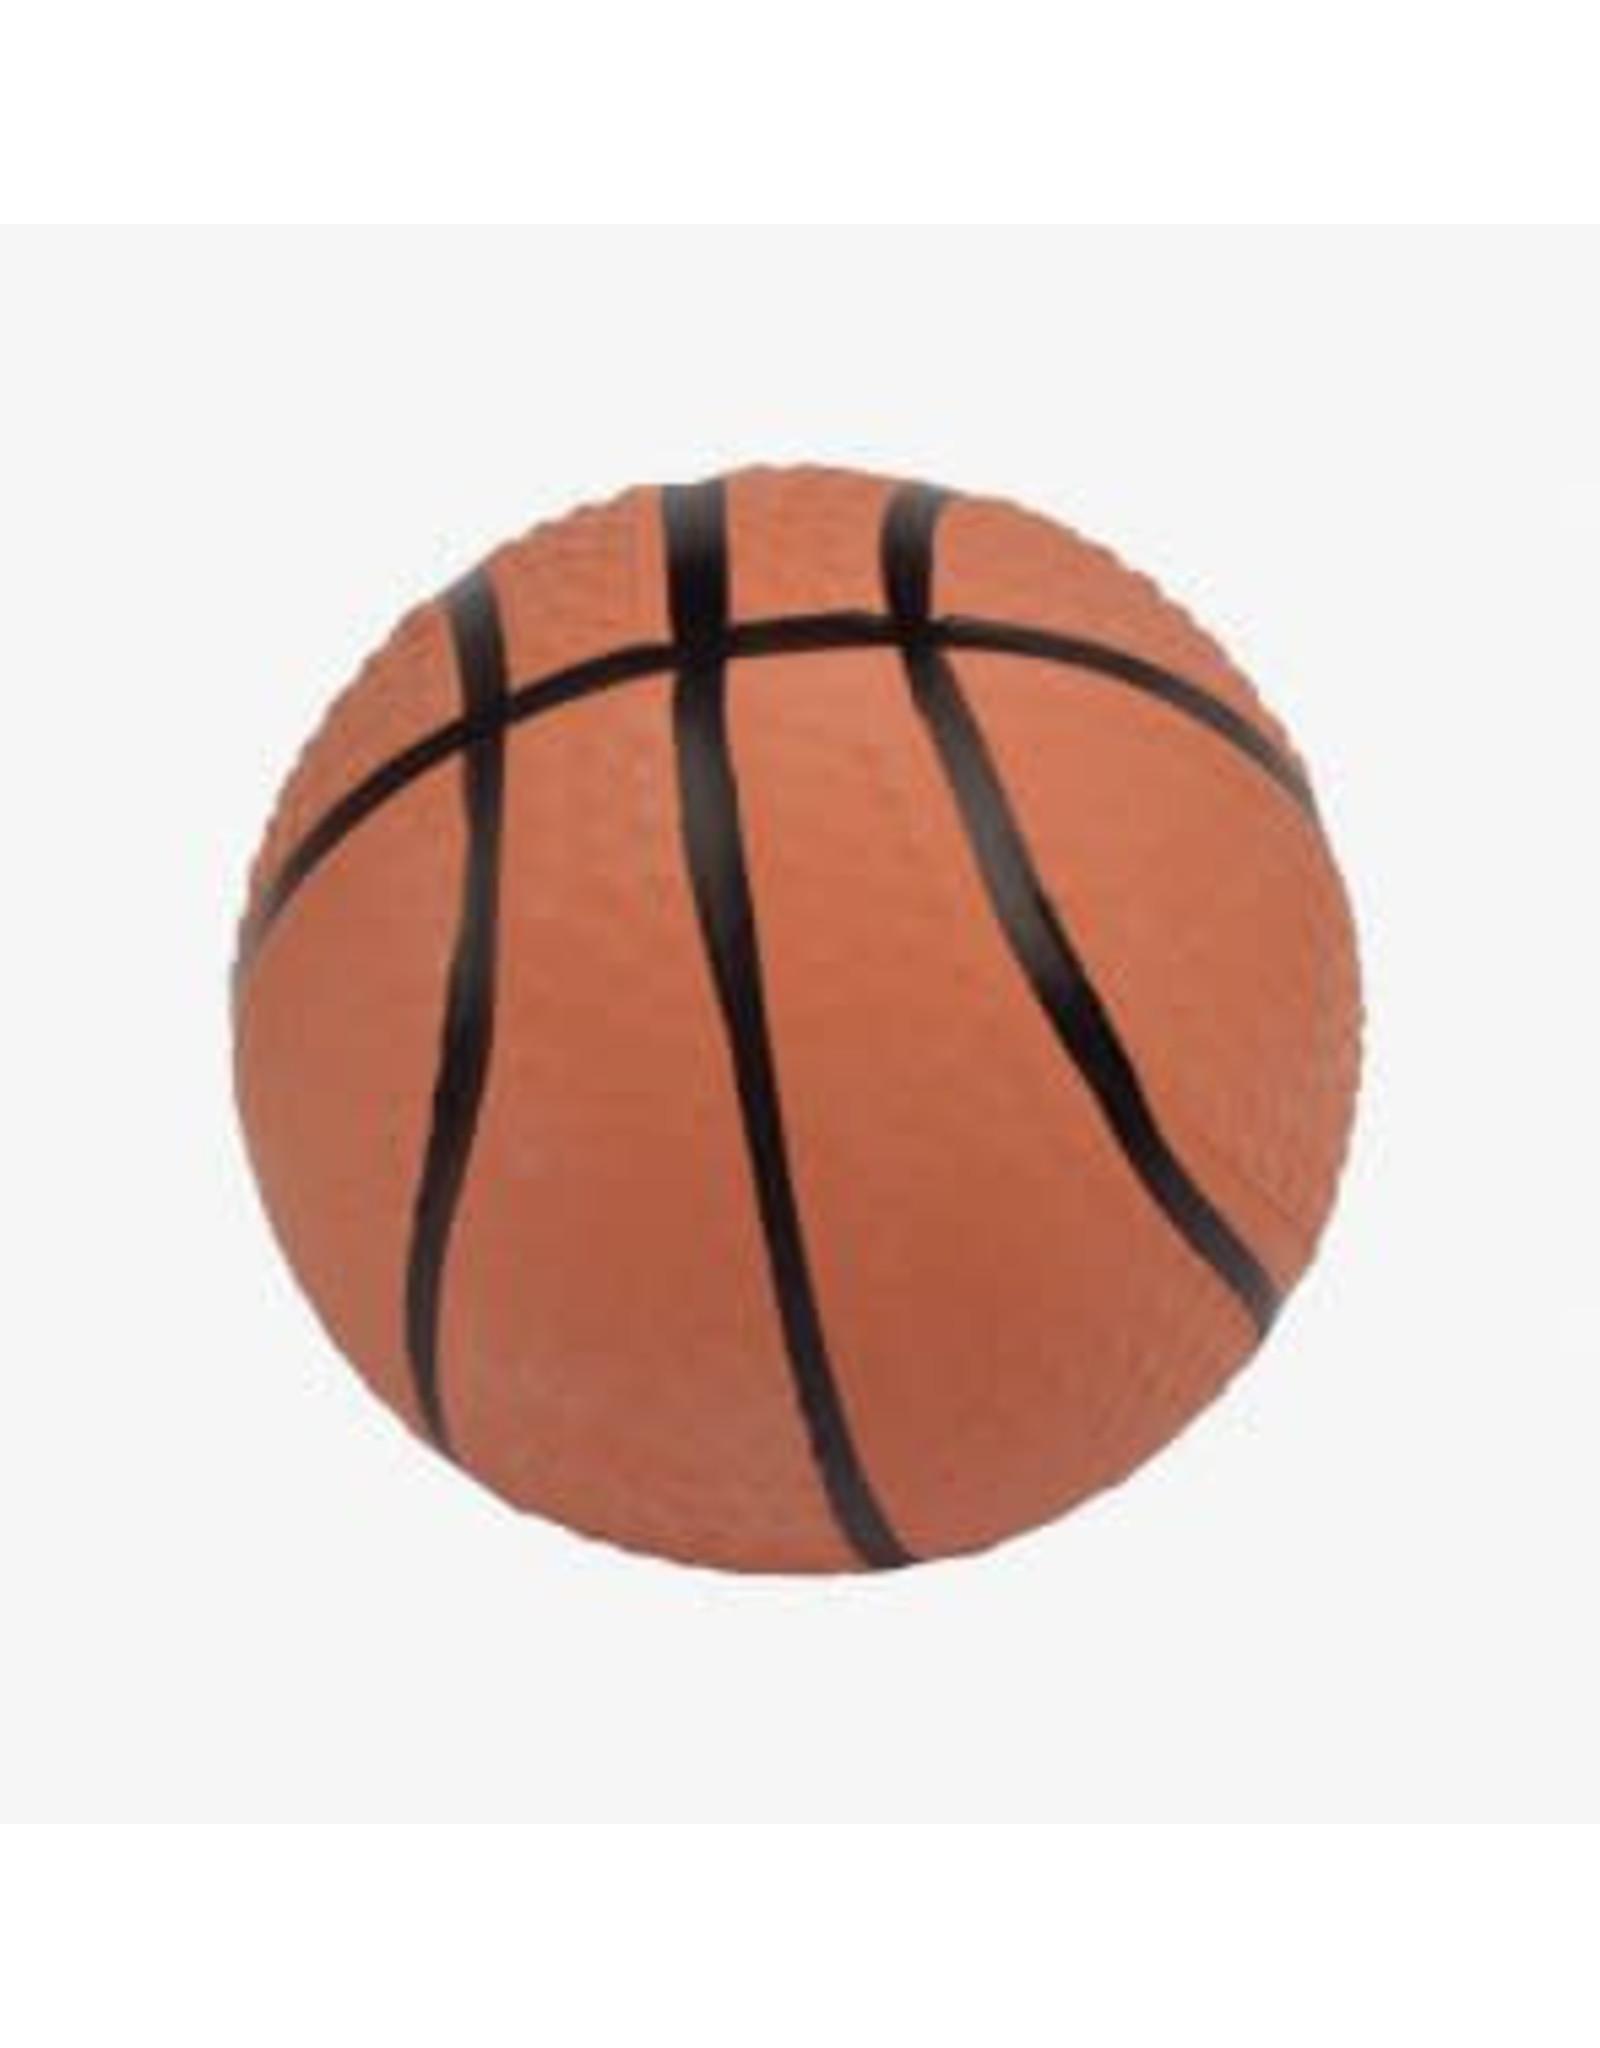 stress ball - basketball